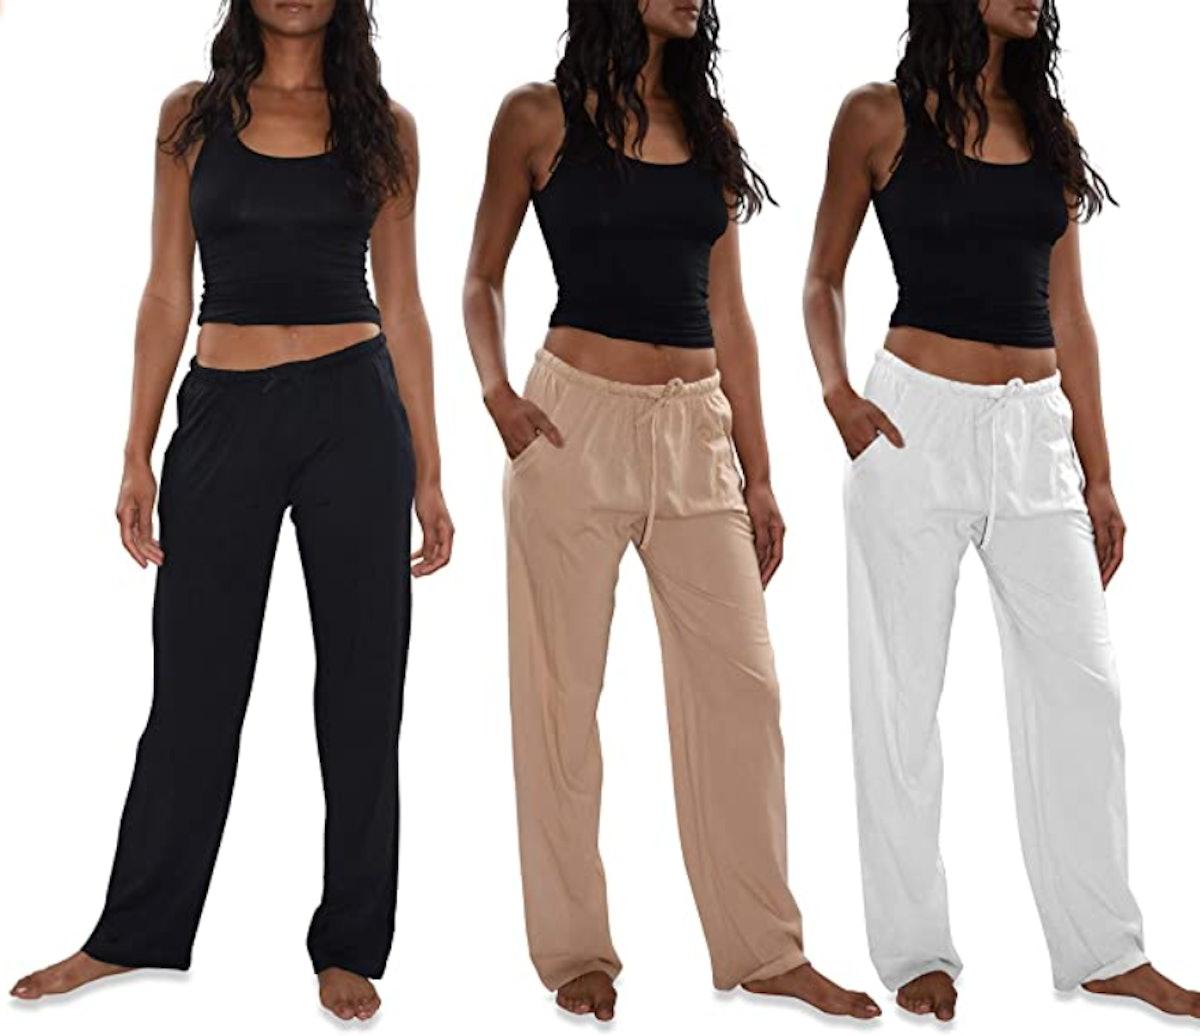 SweatyRocks Active Pants With Pocket (3-Pack)